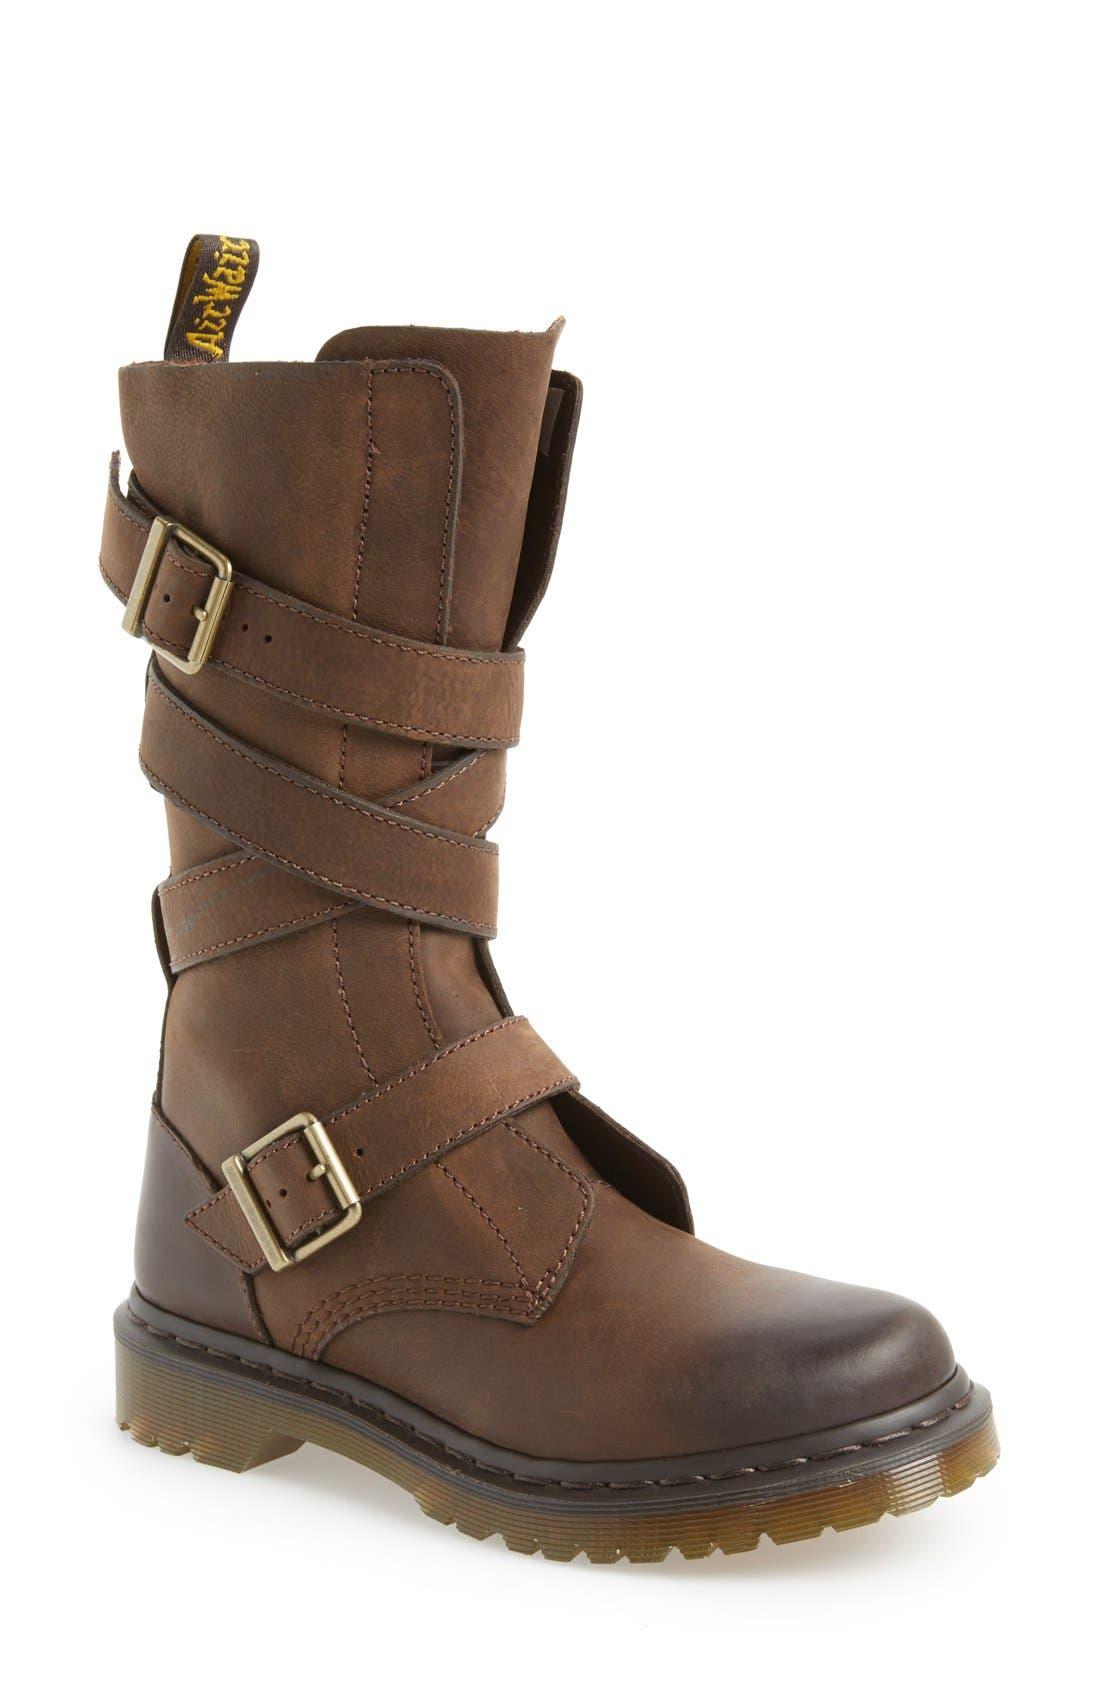 Alternate Image 1 Selected - Dr. Martens 'Lauren' Lug Military Boot (Women)